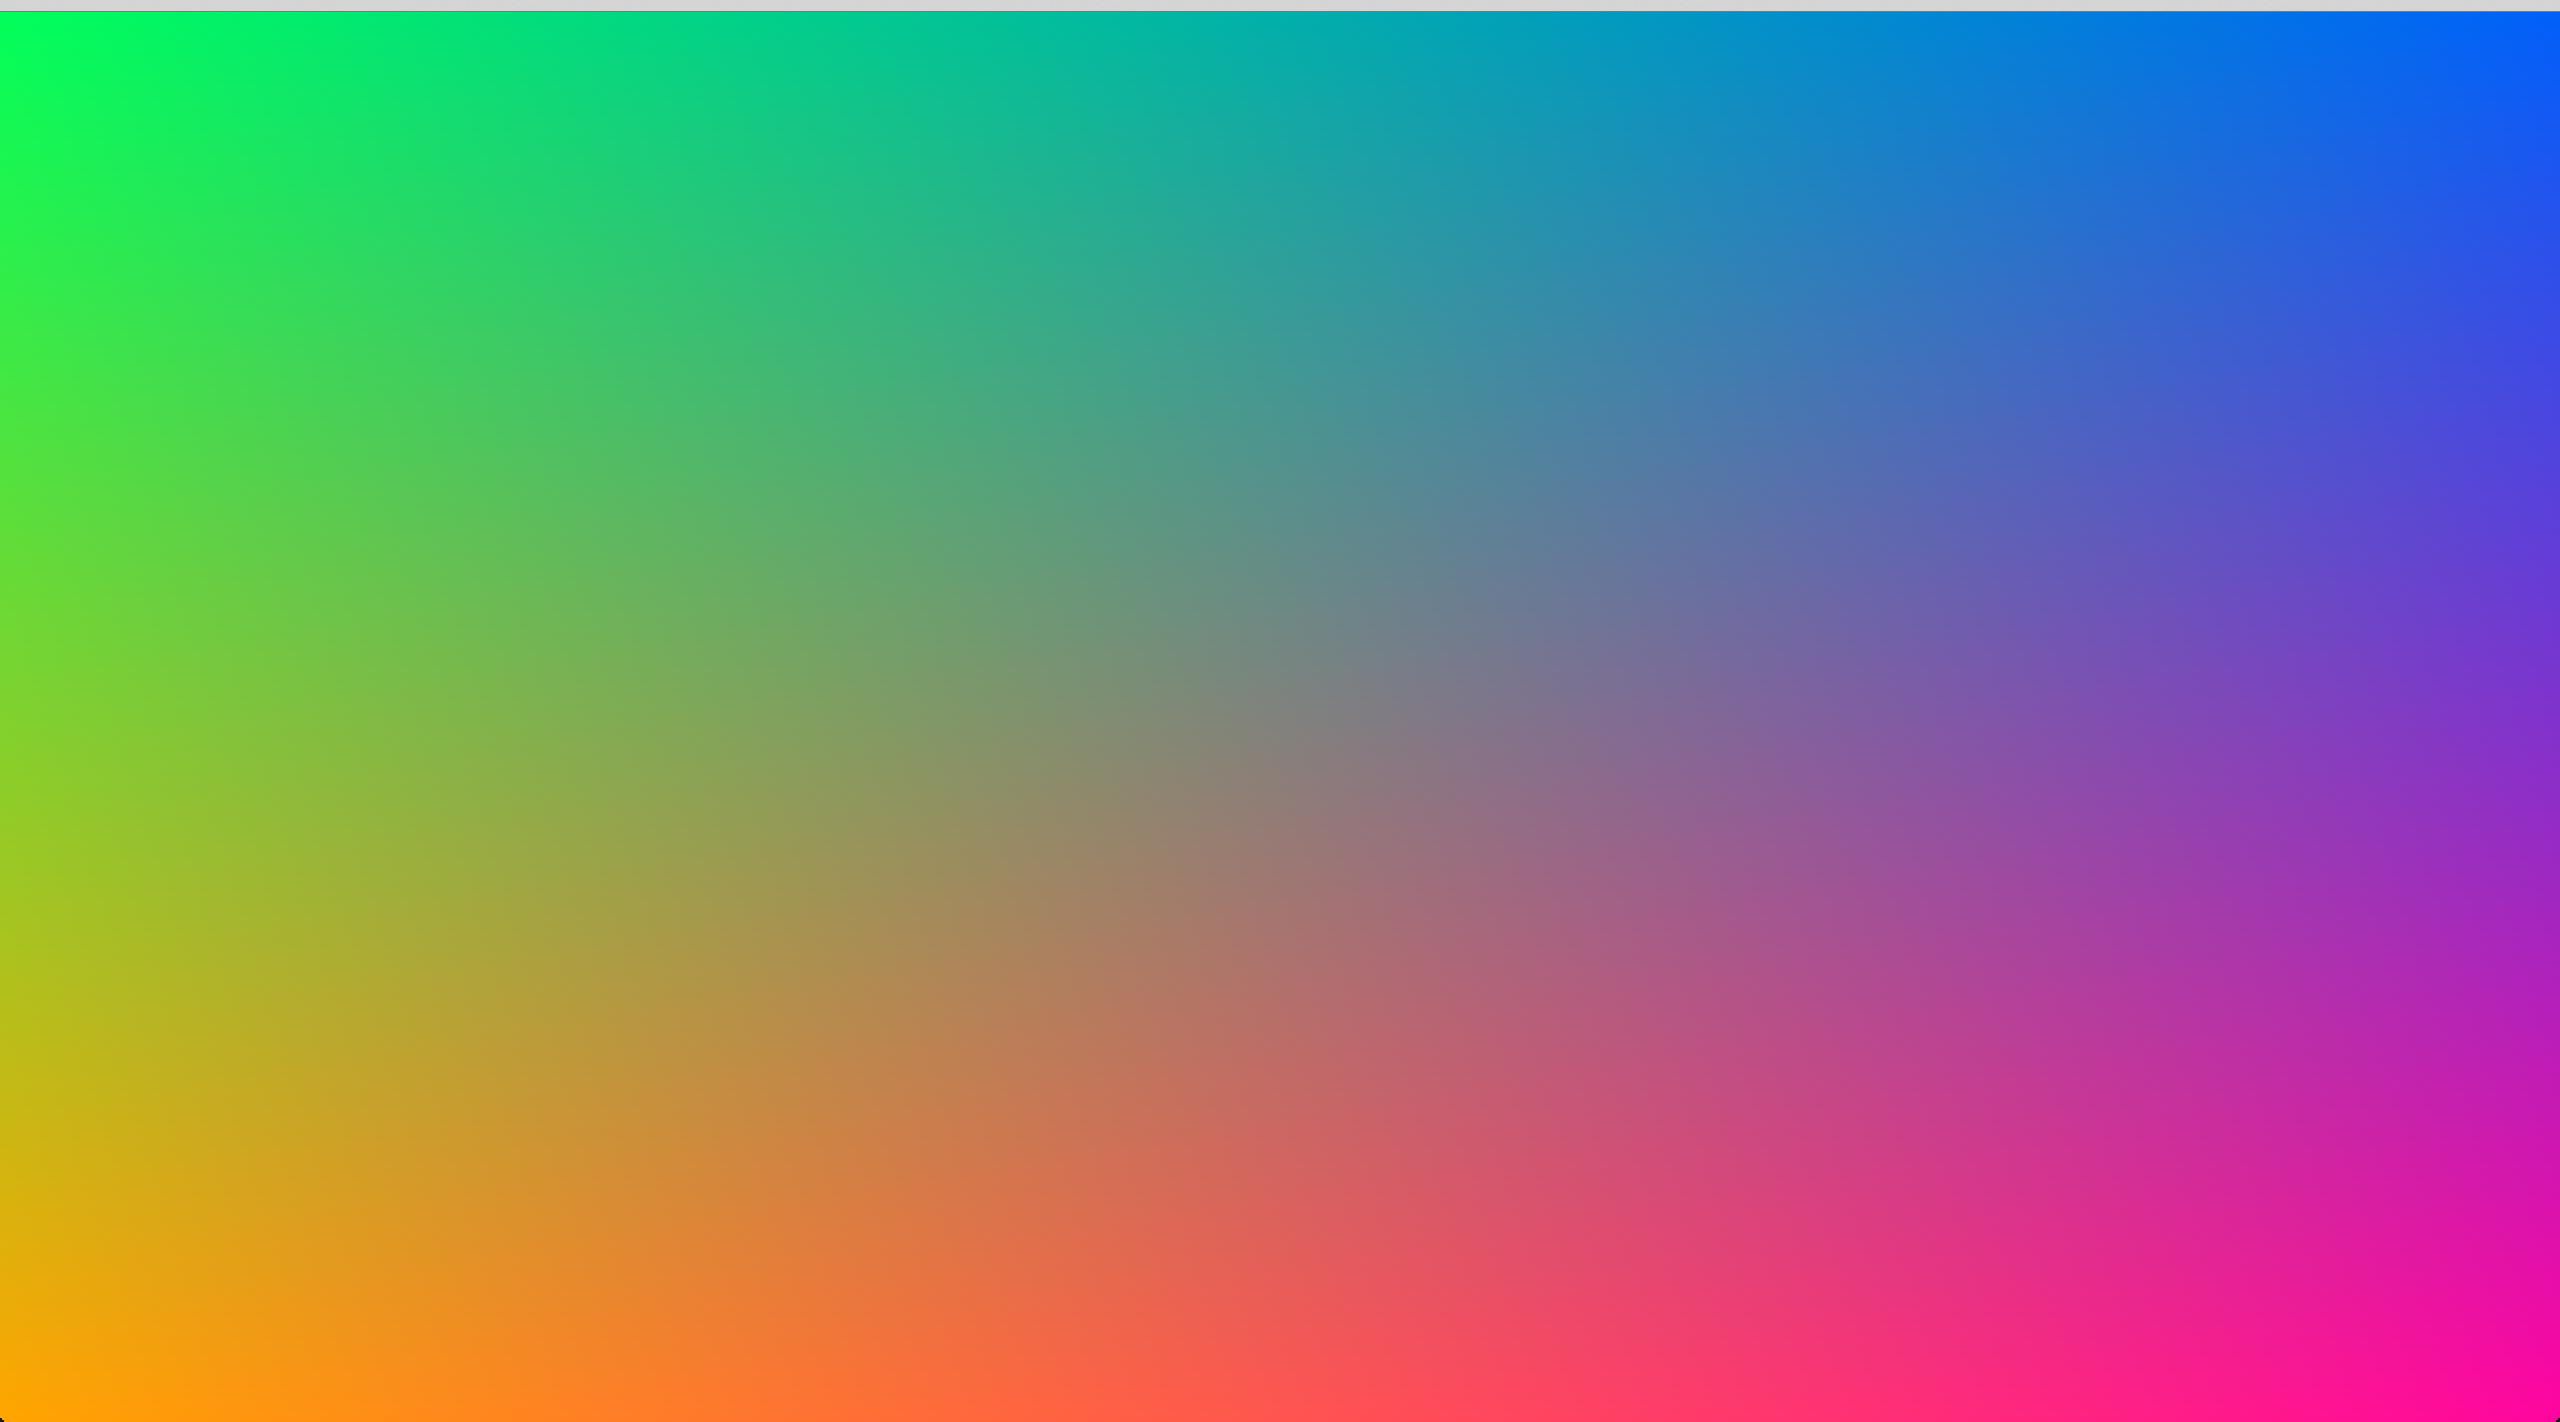 Gradient background 14 iPhone 6 Wallpaper.jpg (750×1334